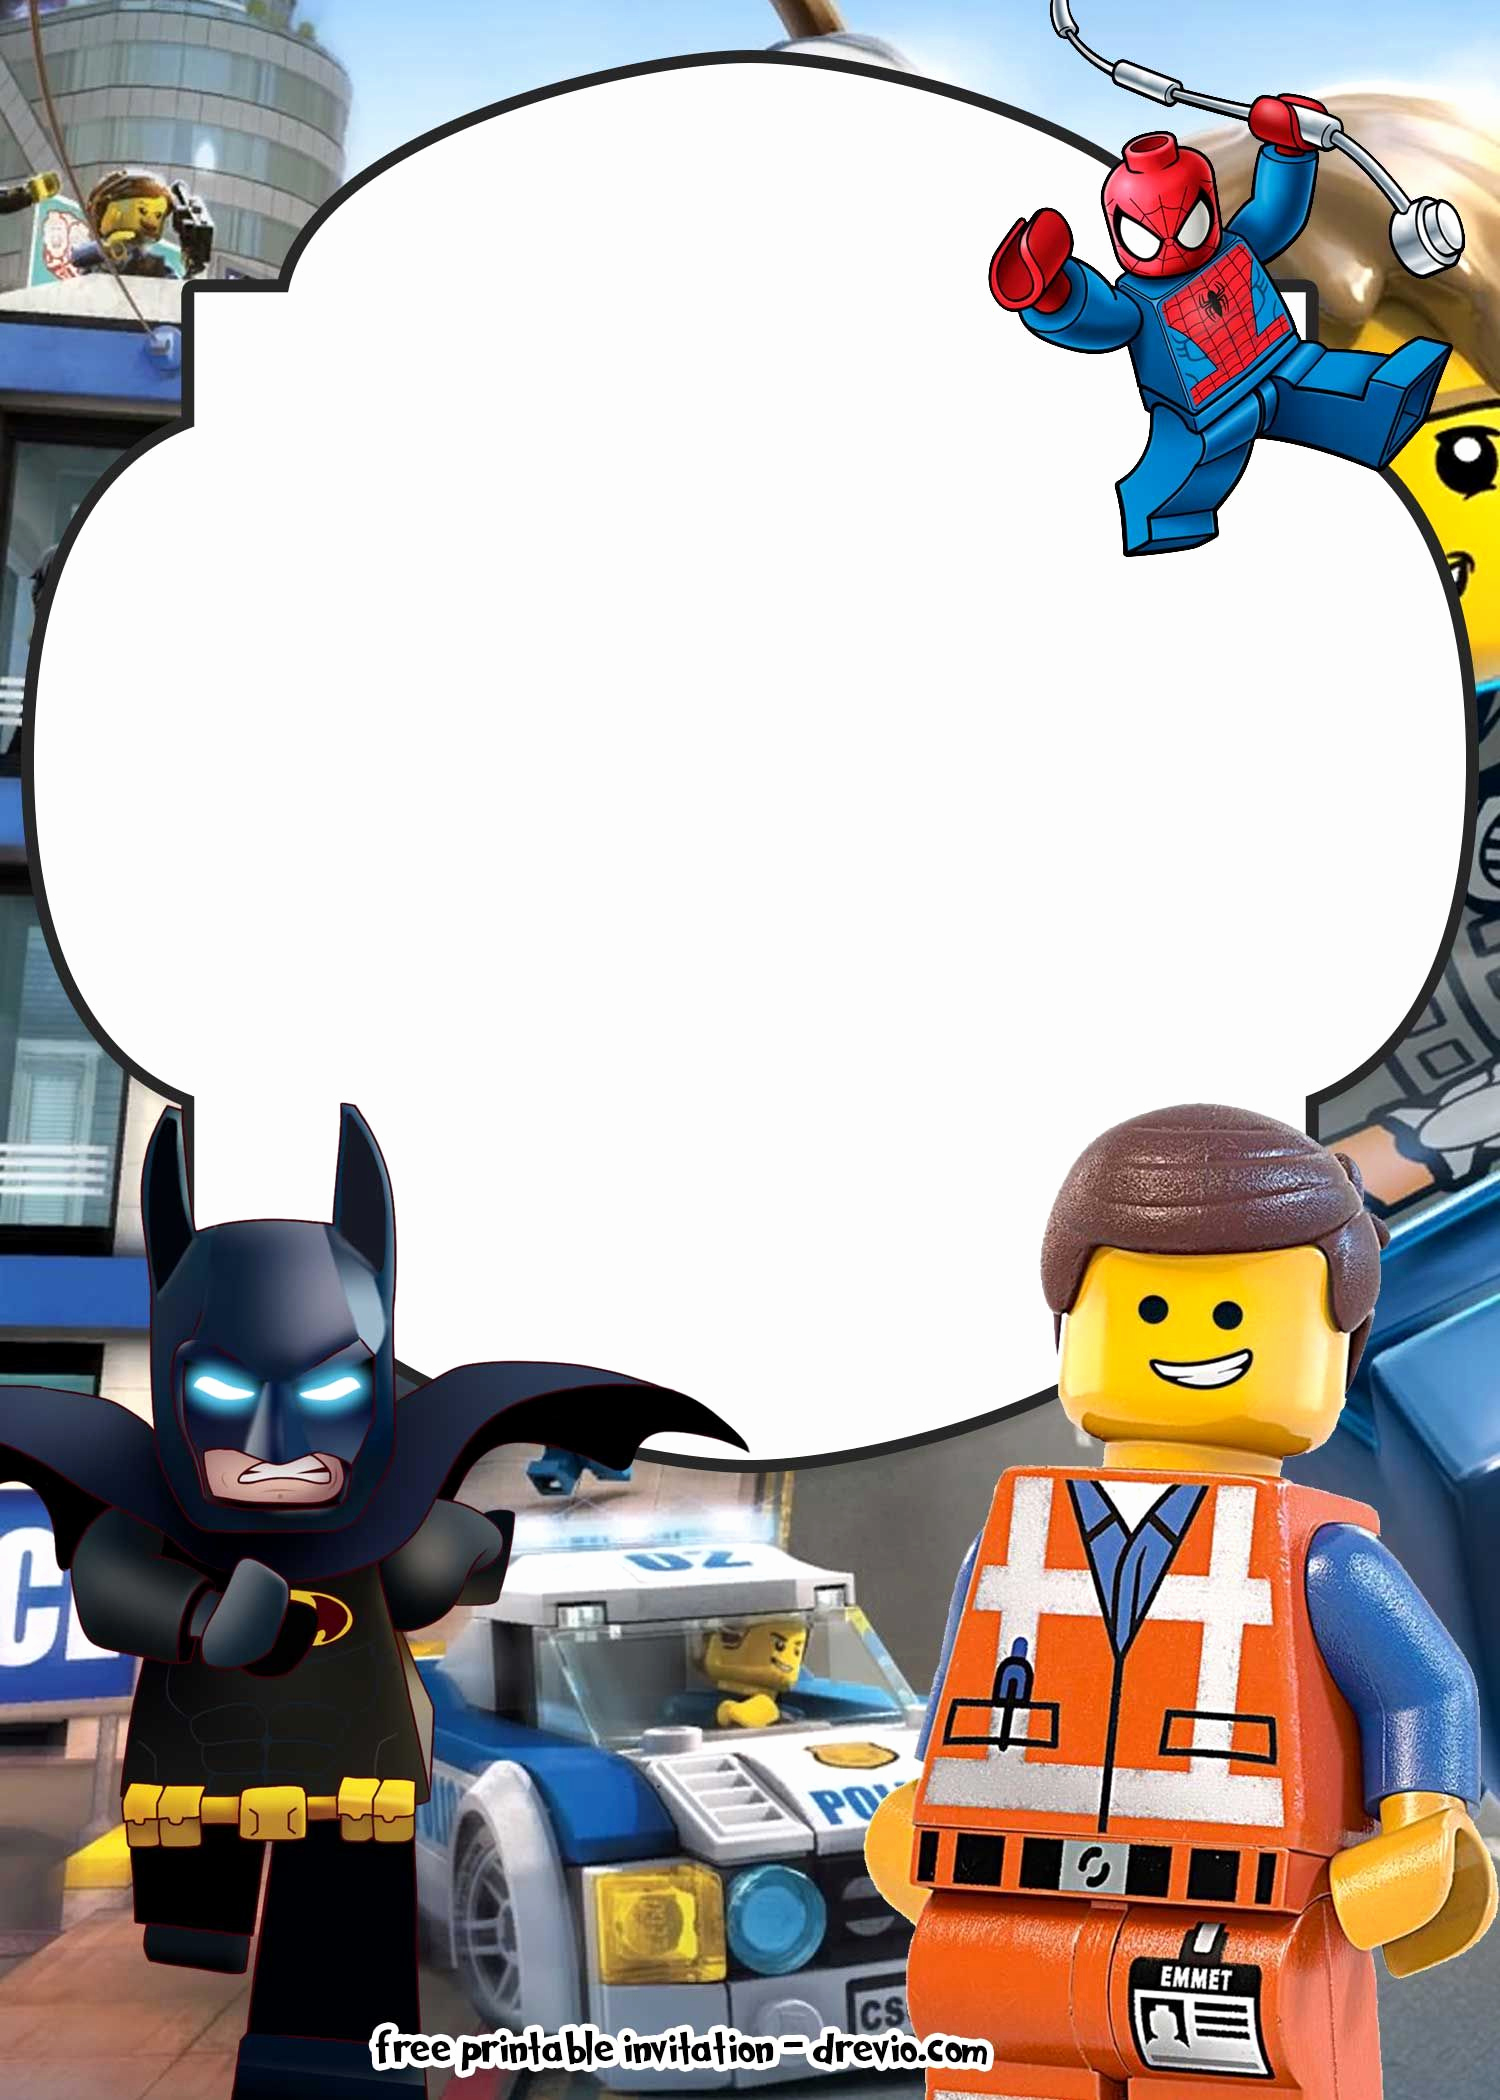 Lego Birthday Invitation Template New Free Lego Movie Invitations for